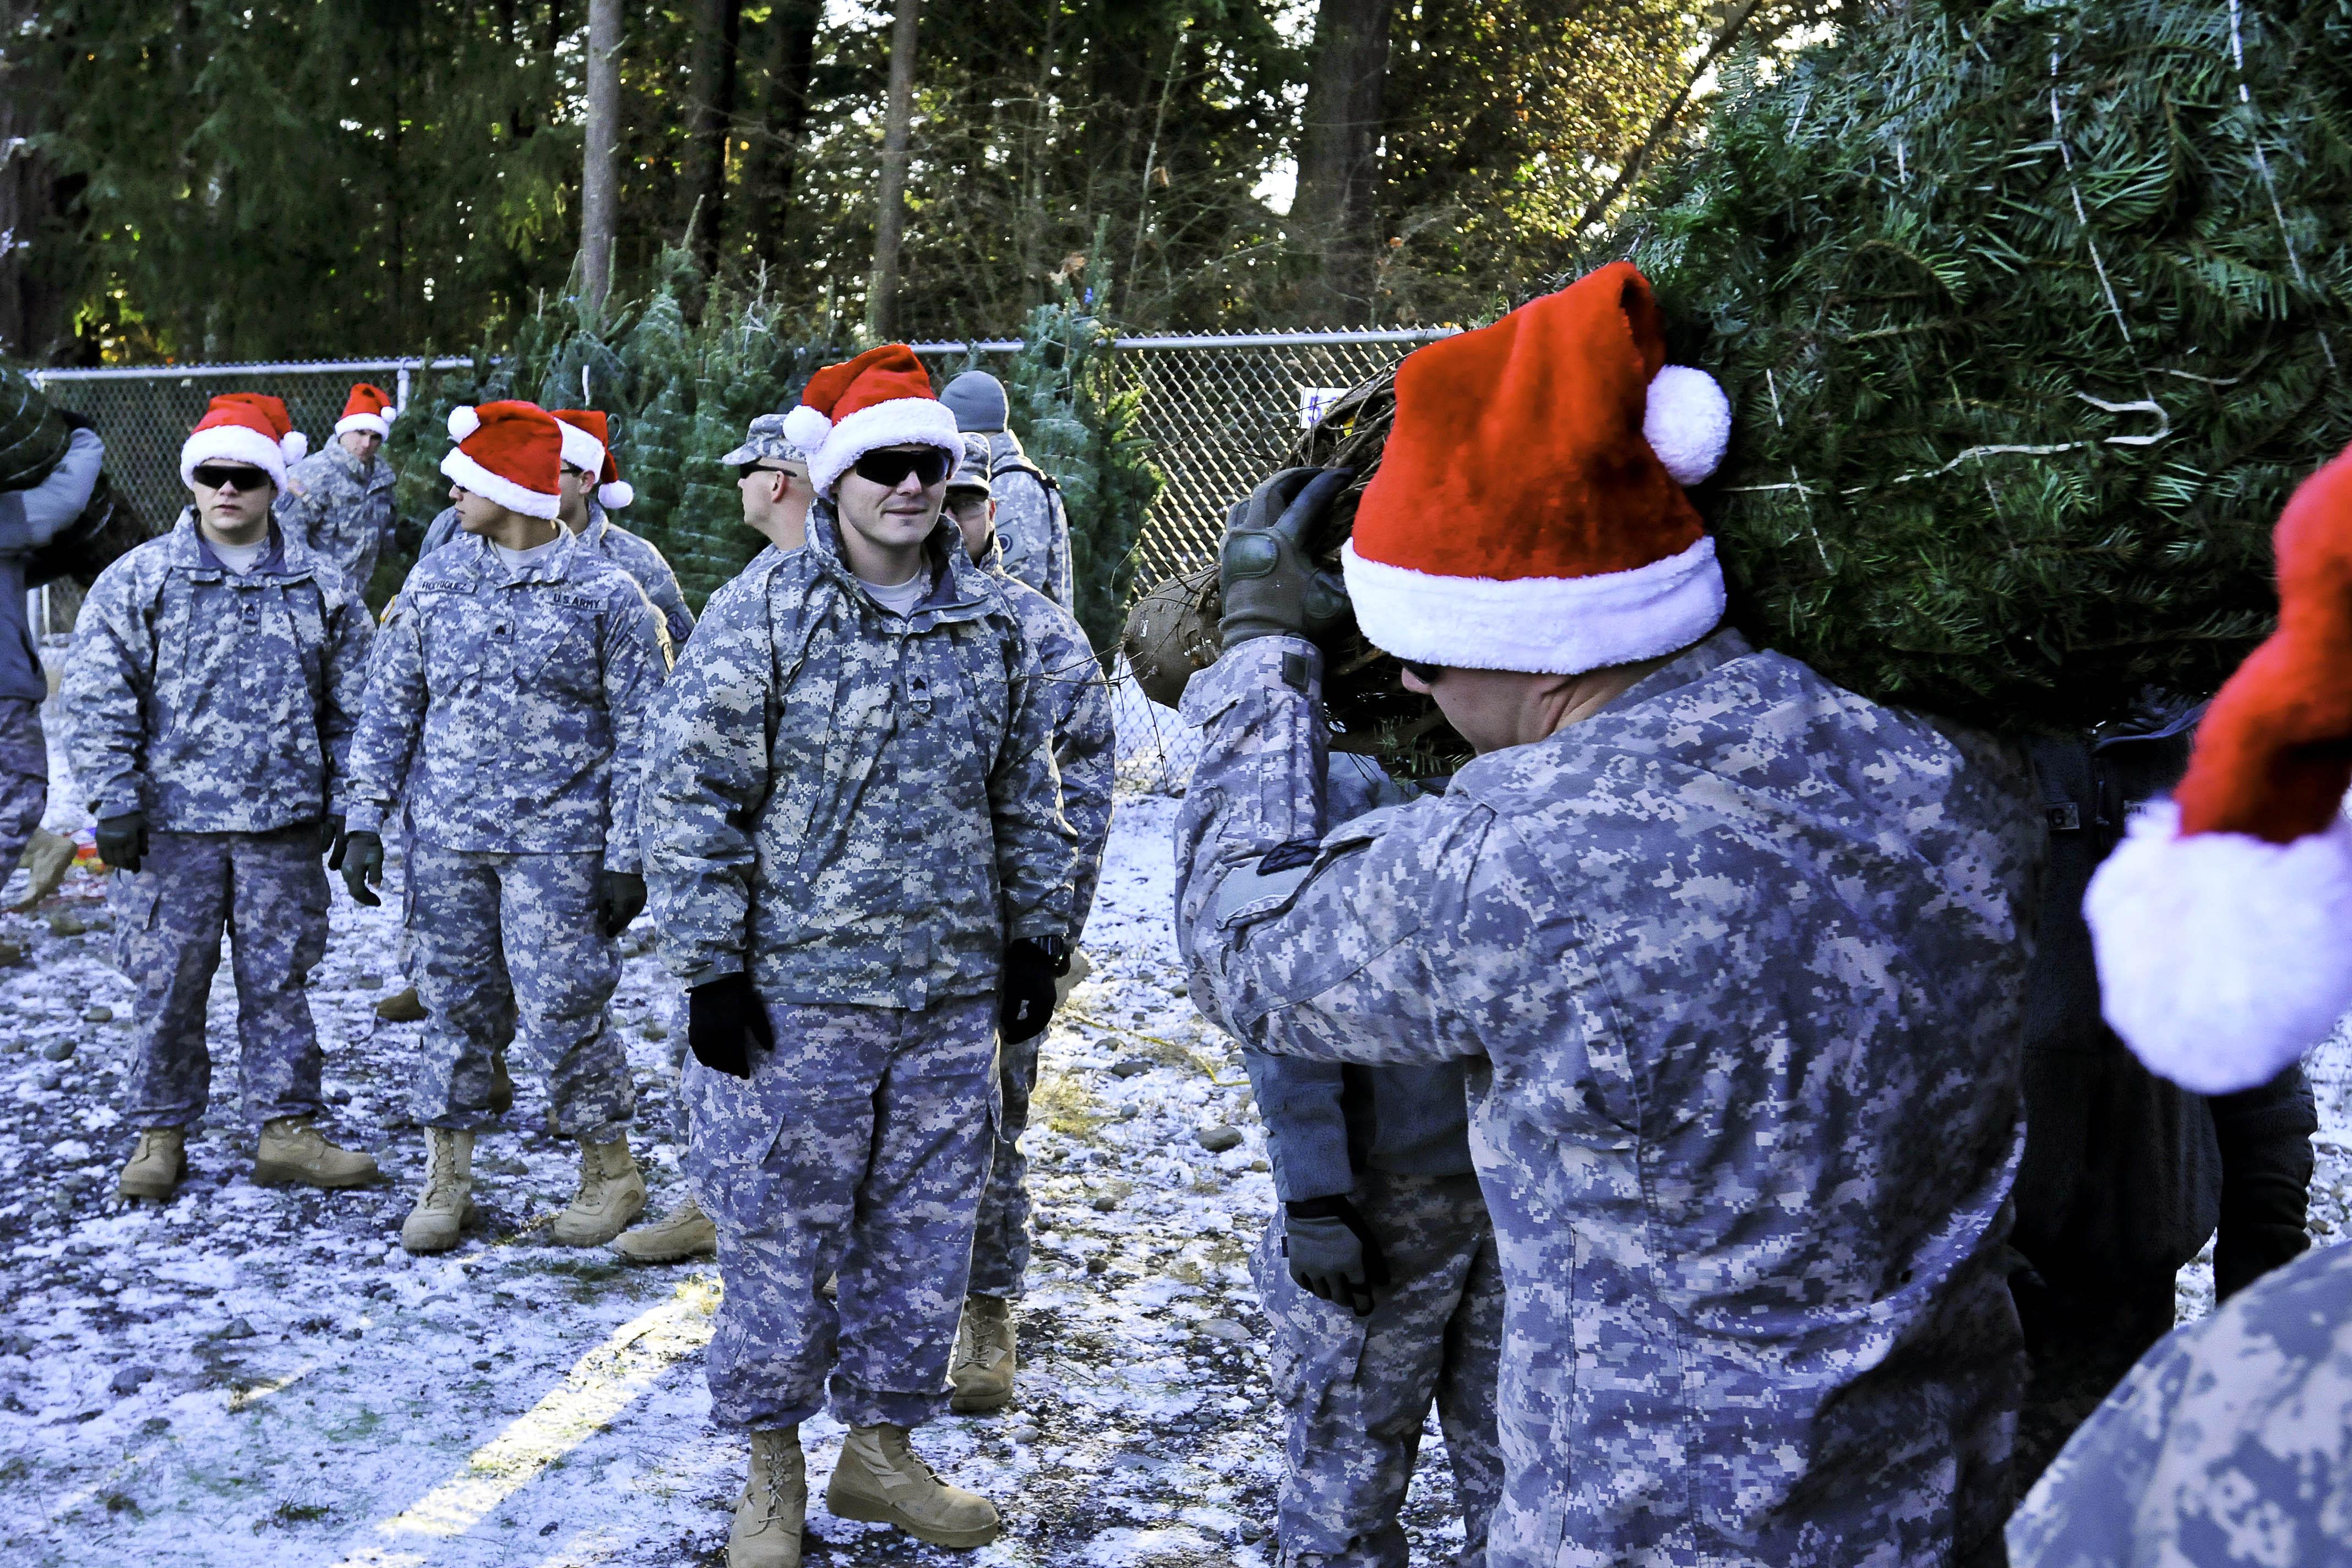 Military in Santa hats